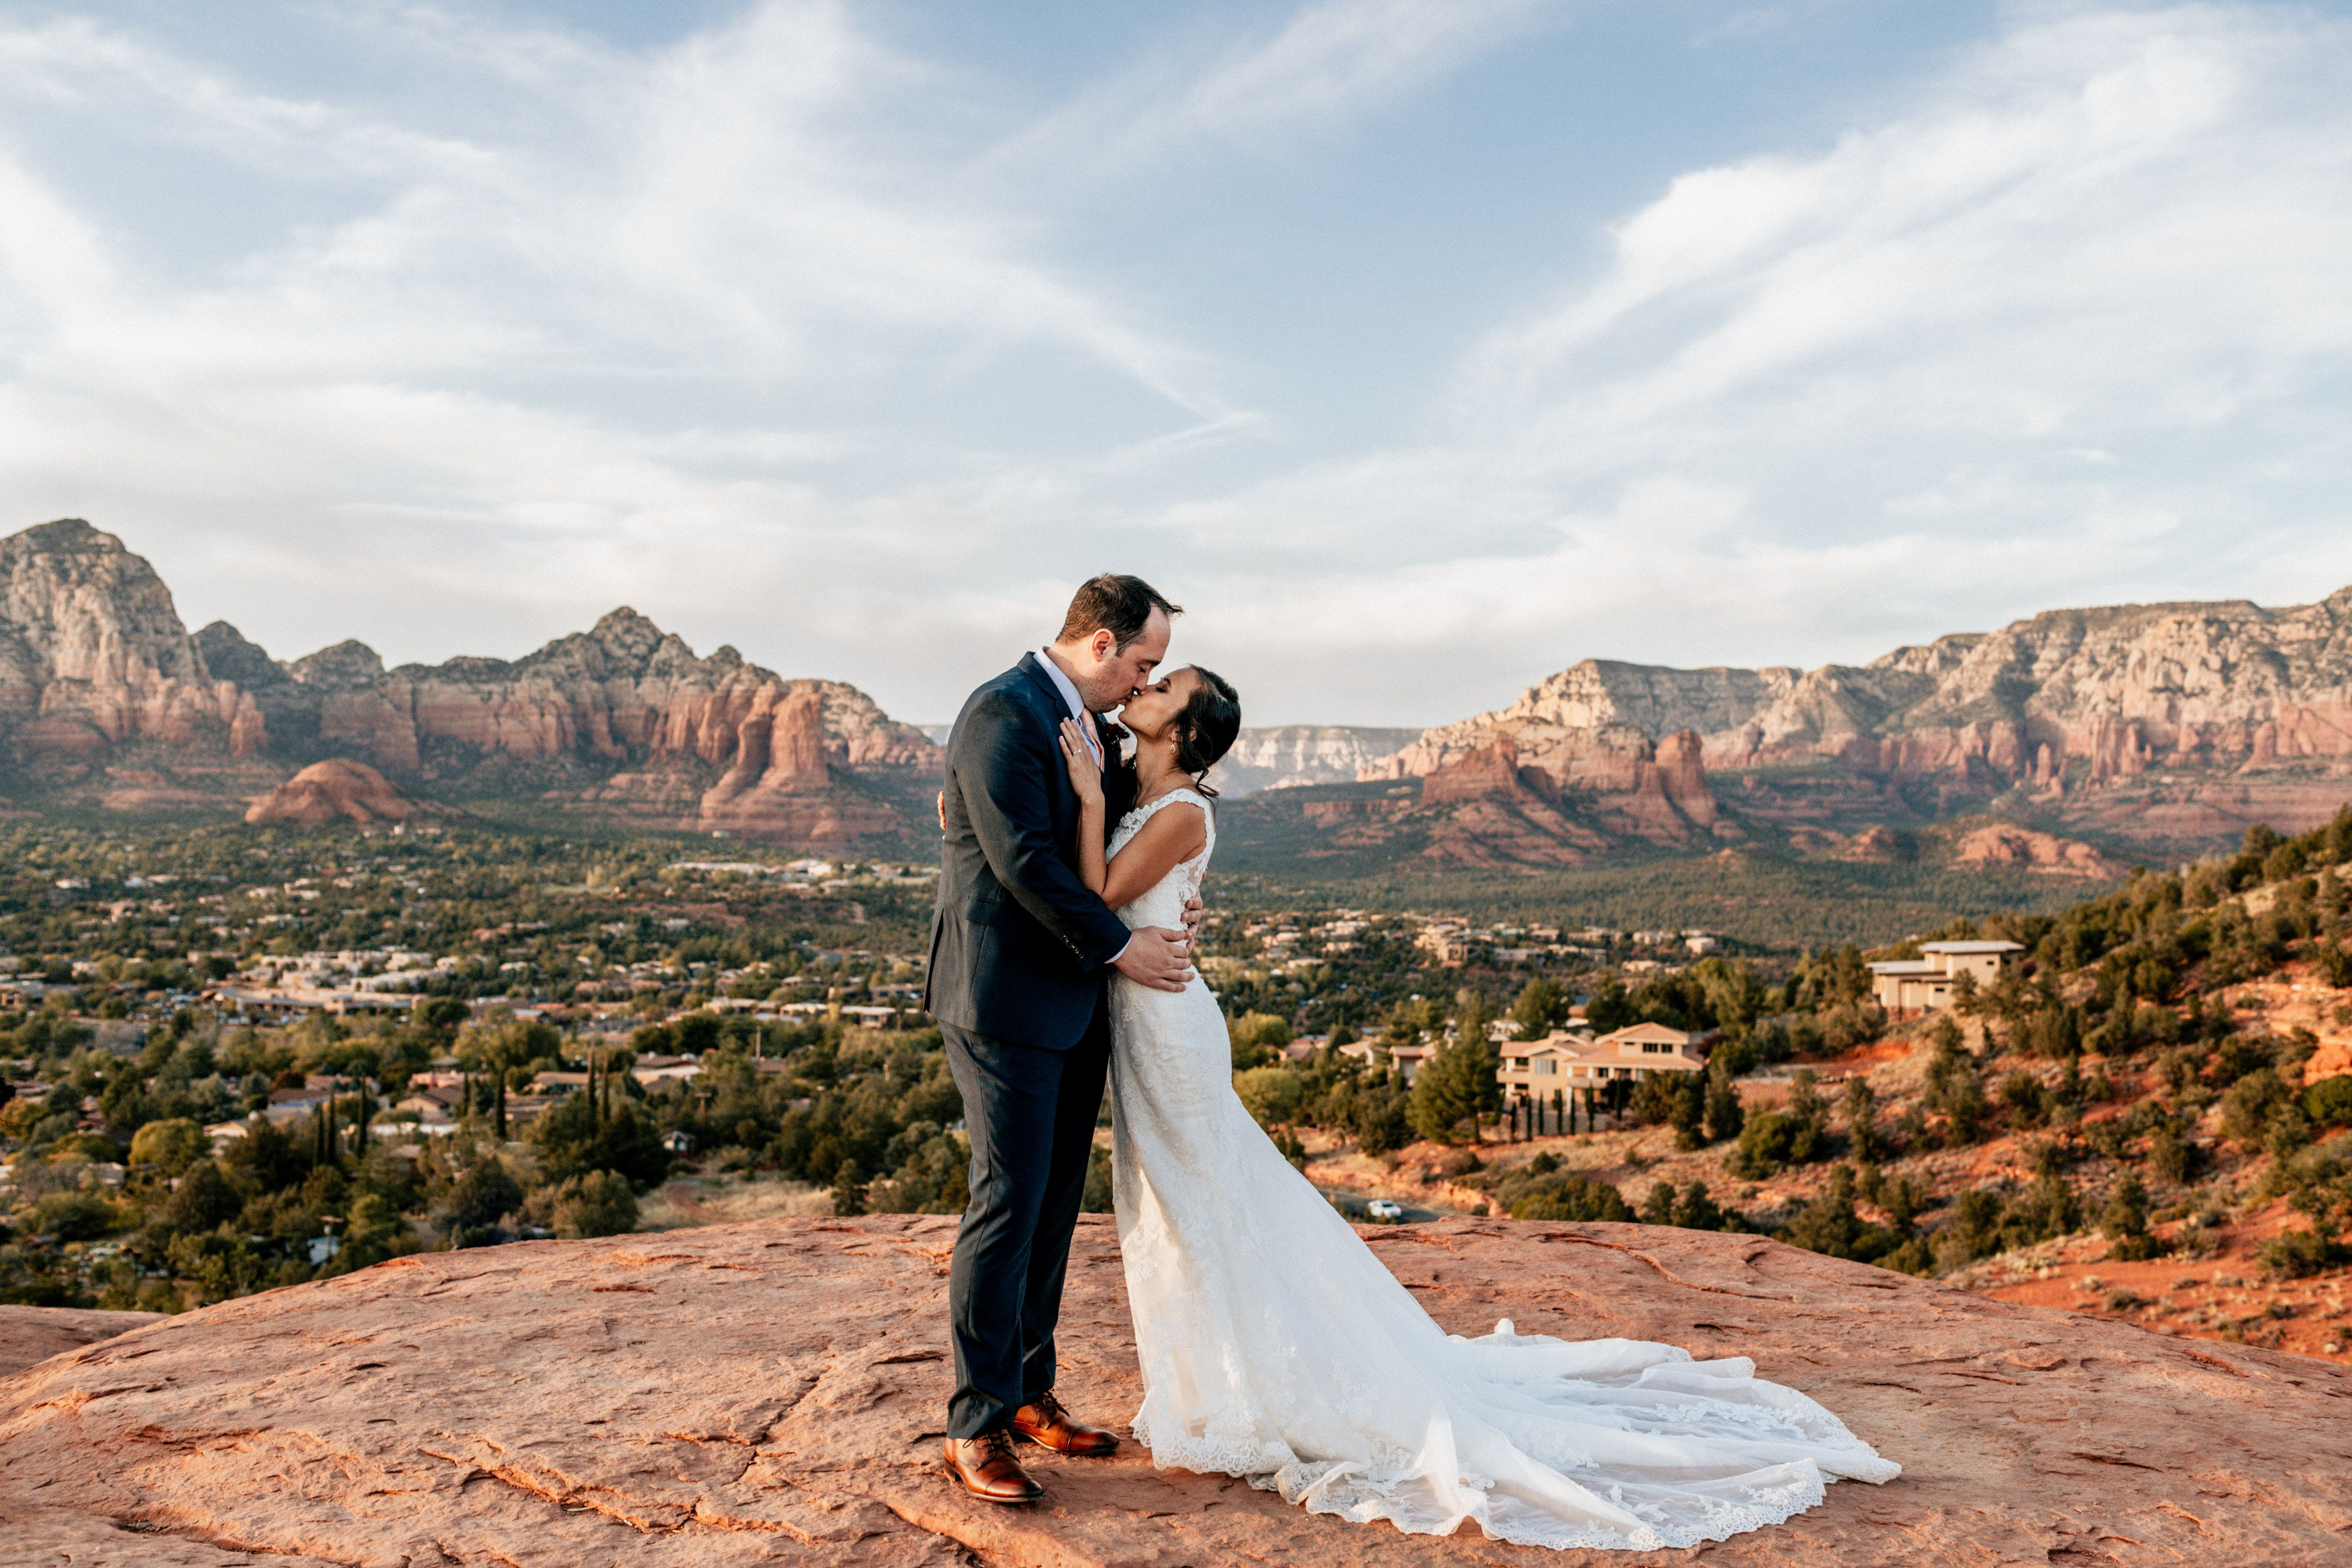 Wedding Photo Inspiration In Sedona Arizona Hochzeitsfotografie Hochzeitsfoto Idee Hochzeitsfotos